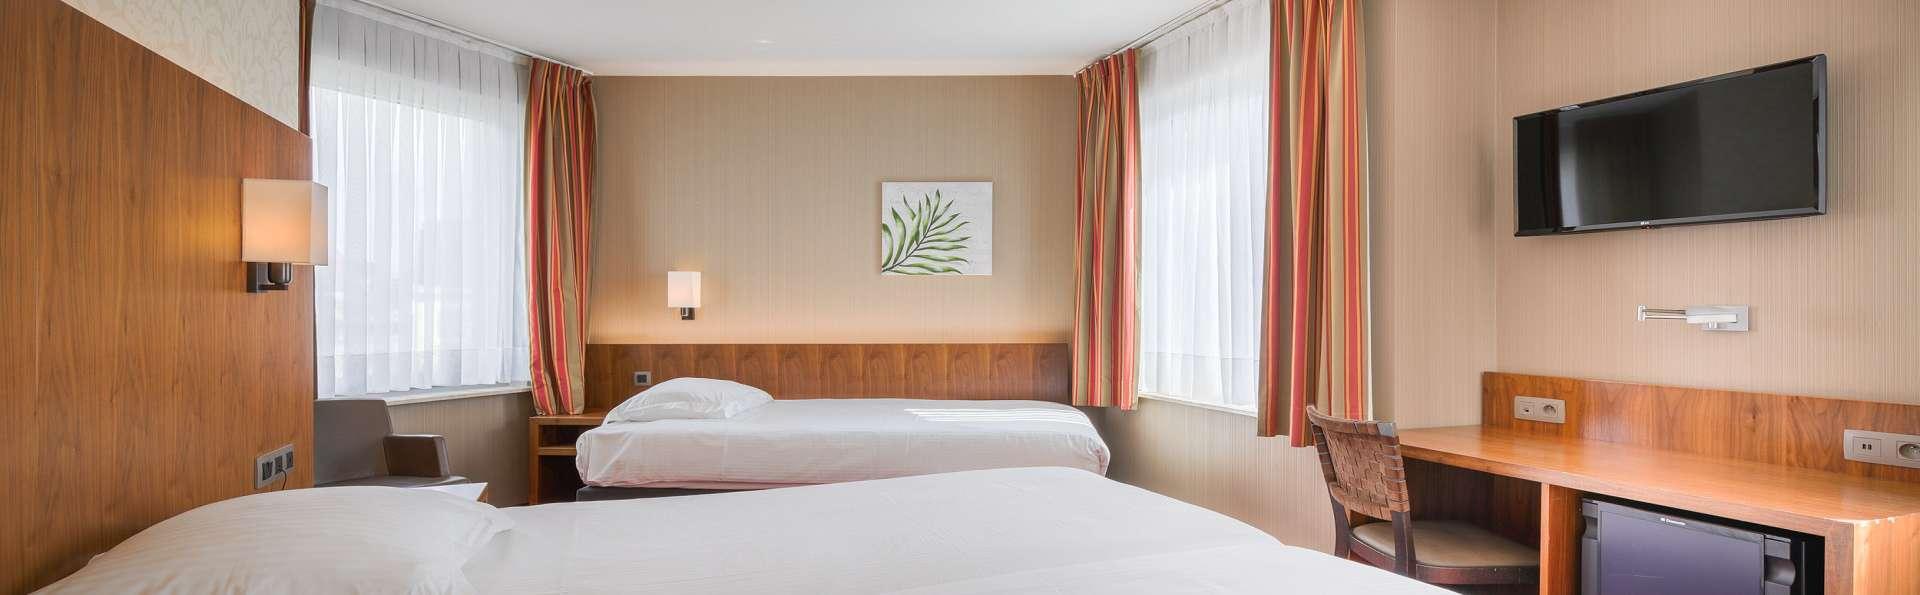 Hotel Chamade - Triple2.jpg